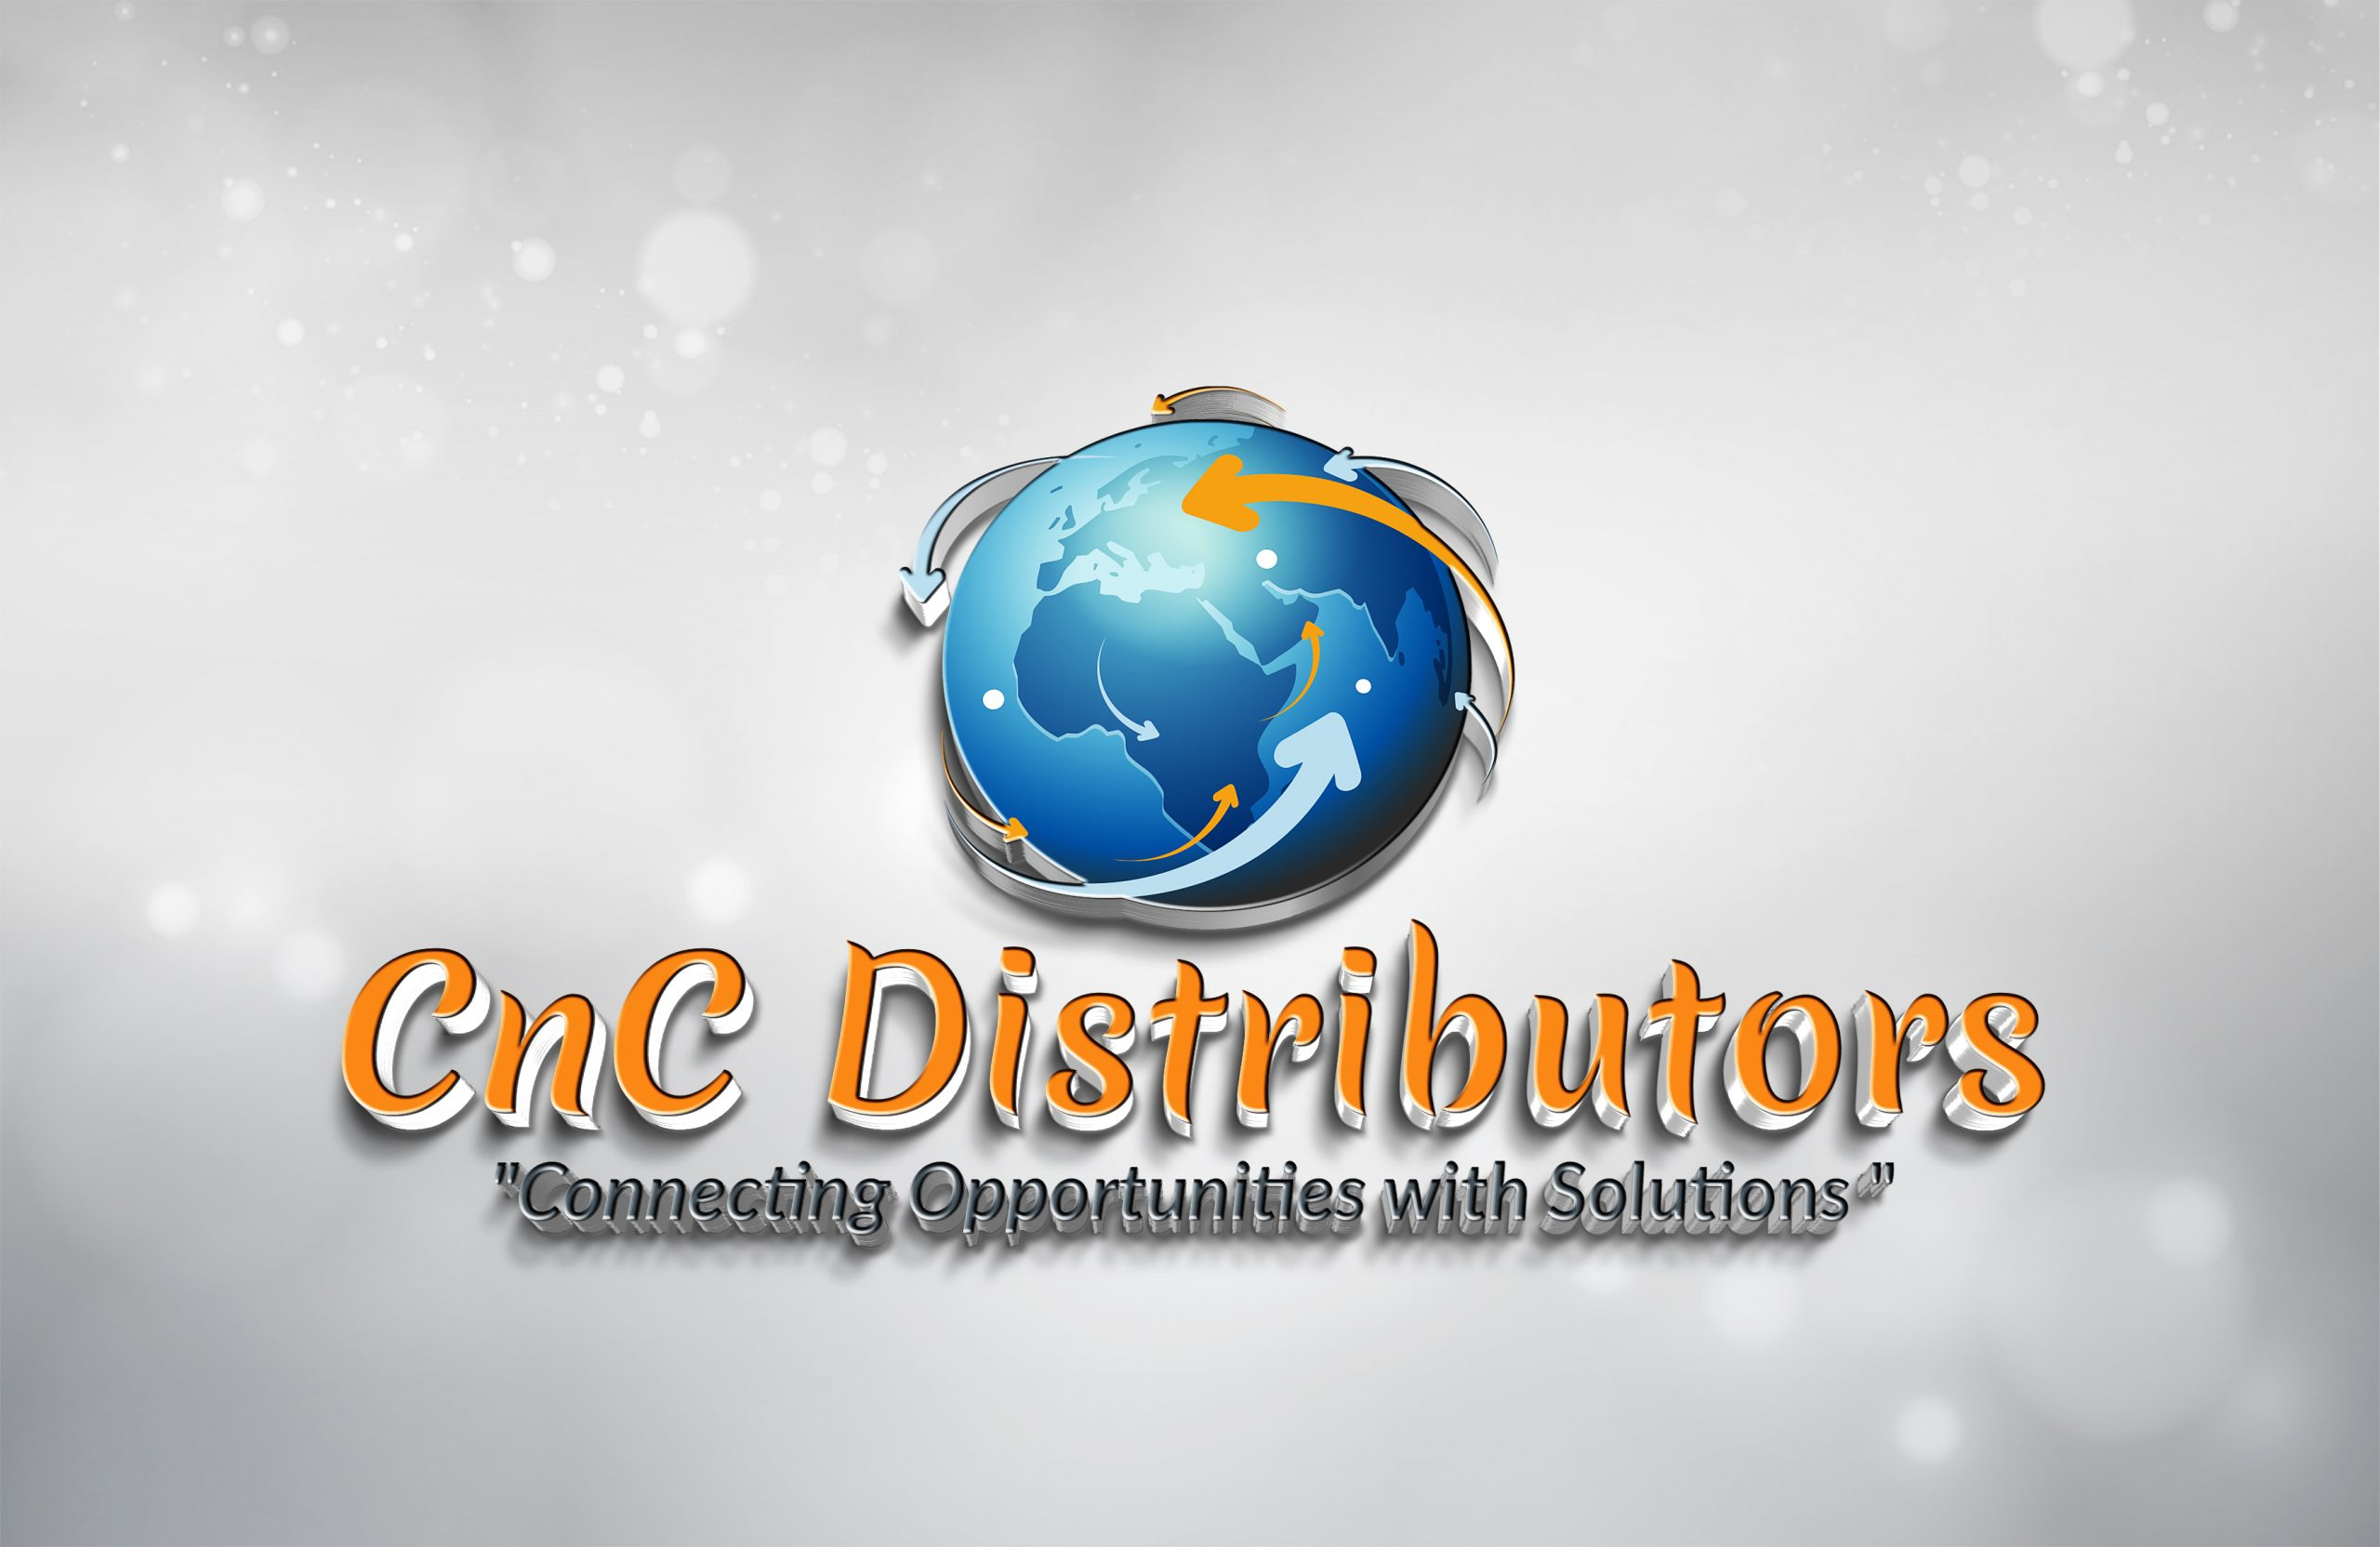 Business Listing for YE Stellenbosch Inter Alia (Pty) Ltd trading as CnC Distributors